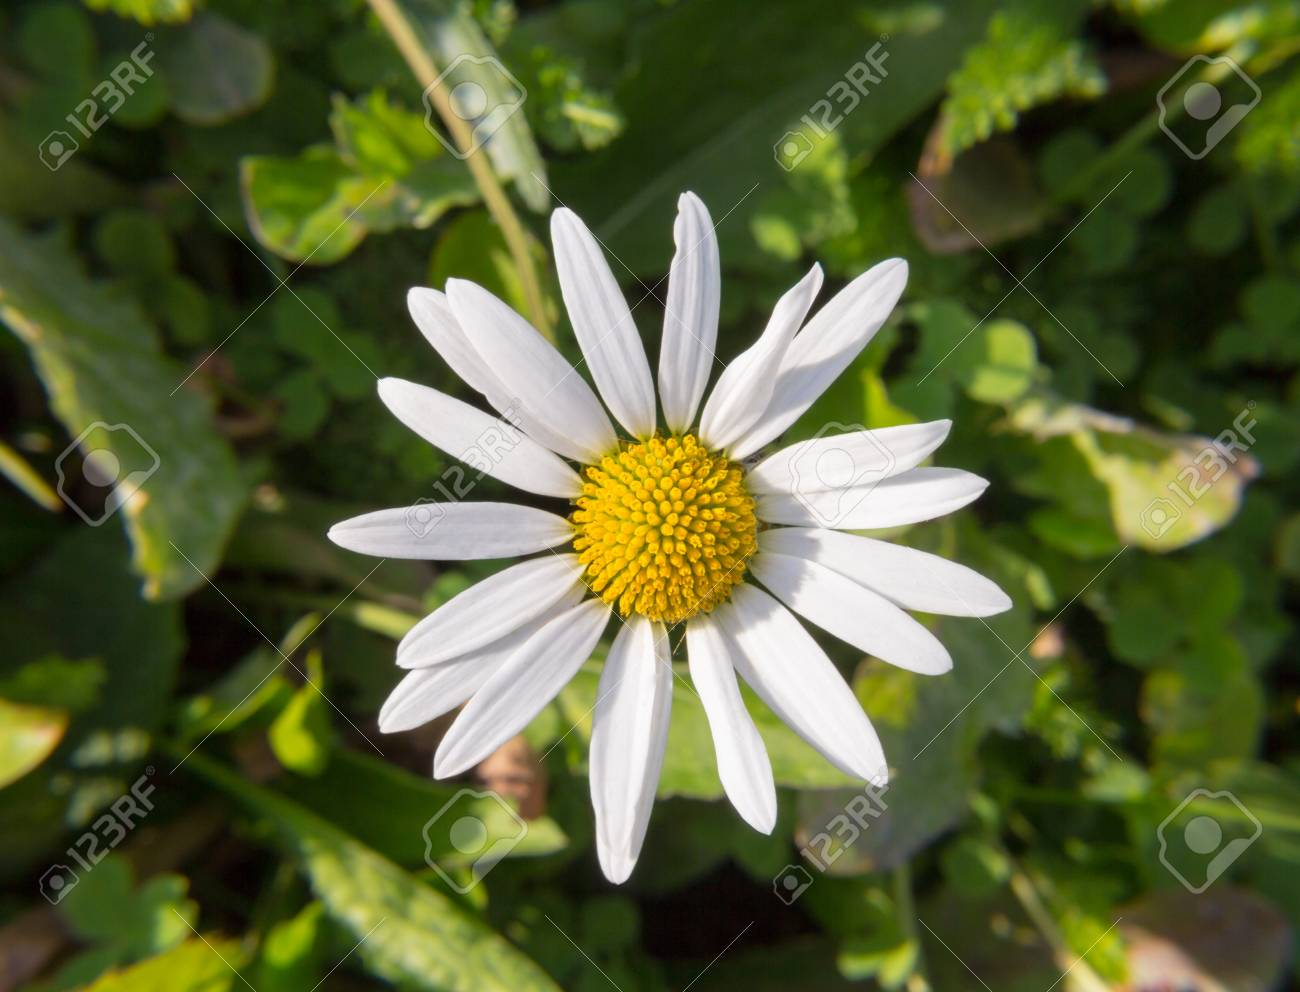 Flower daisy white yellow close up one petal wildlife flower daisy white yellow close up one petal mightylinksfo